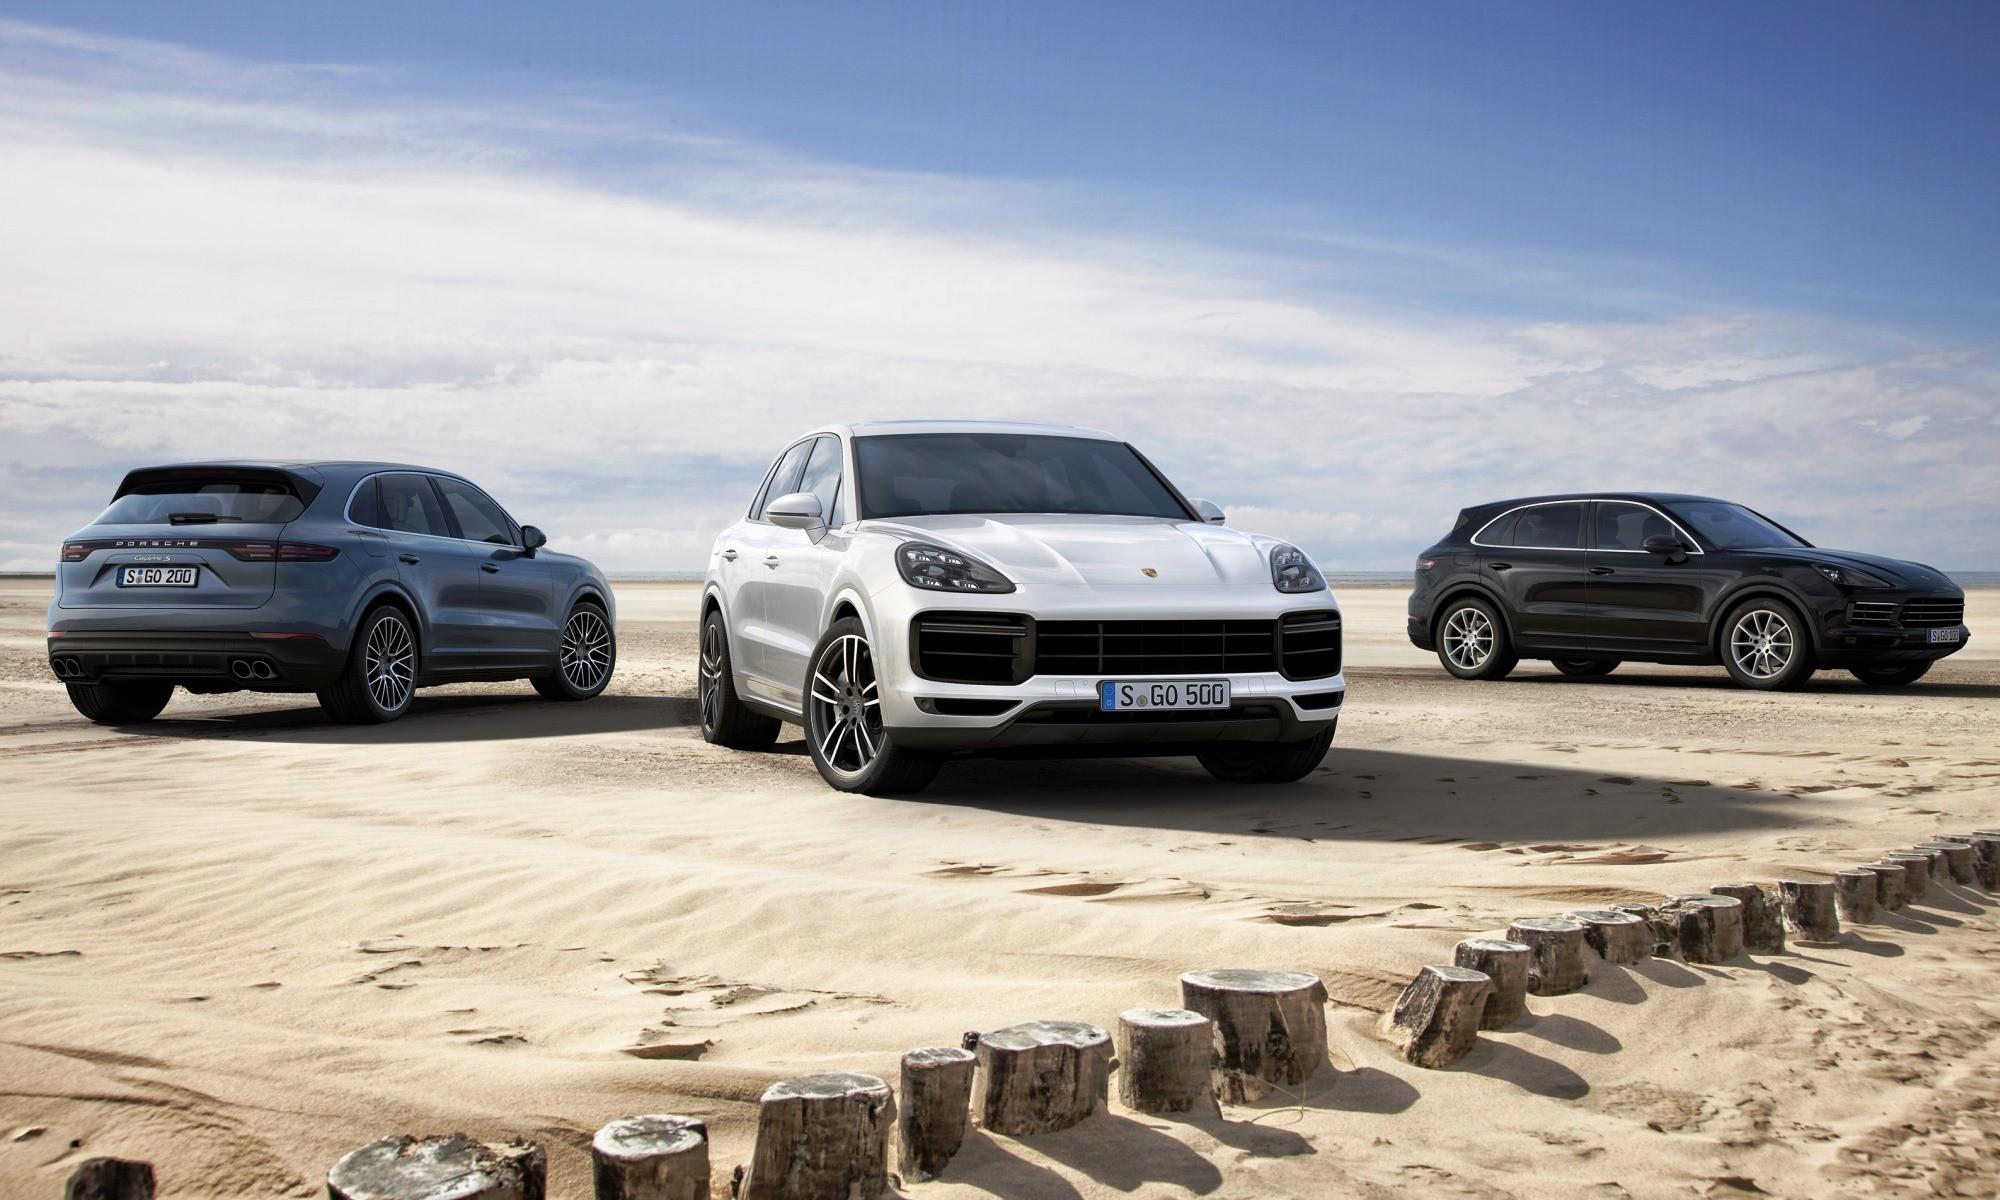 The new Porsche Cayenne family